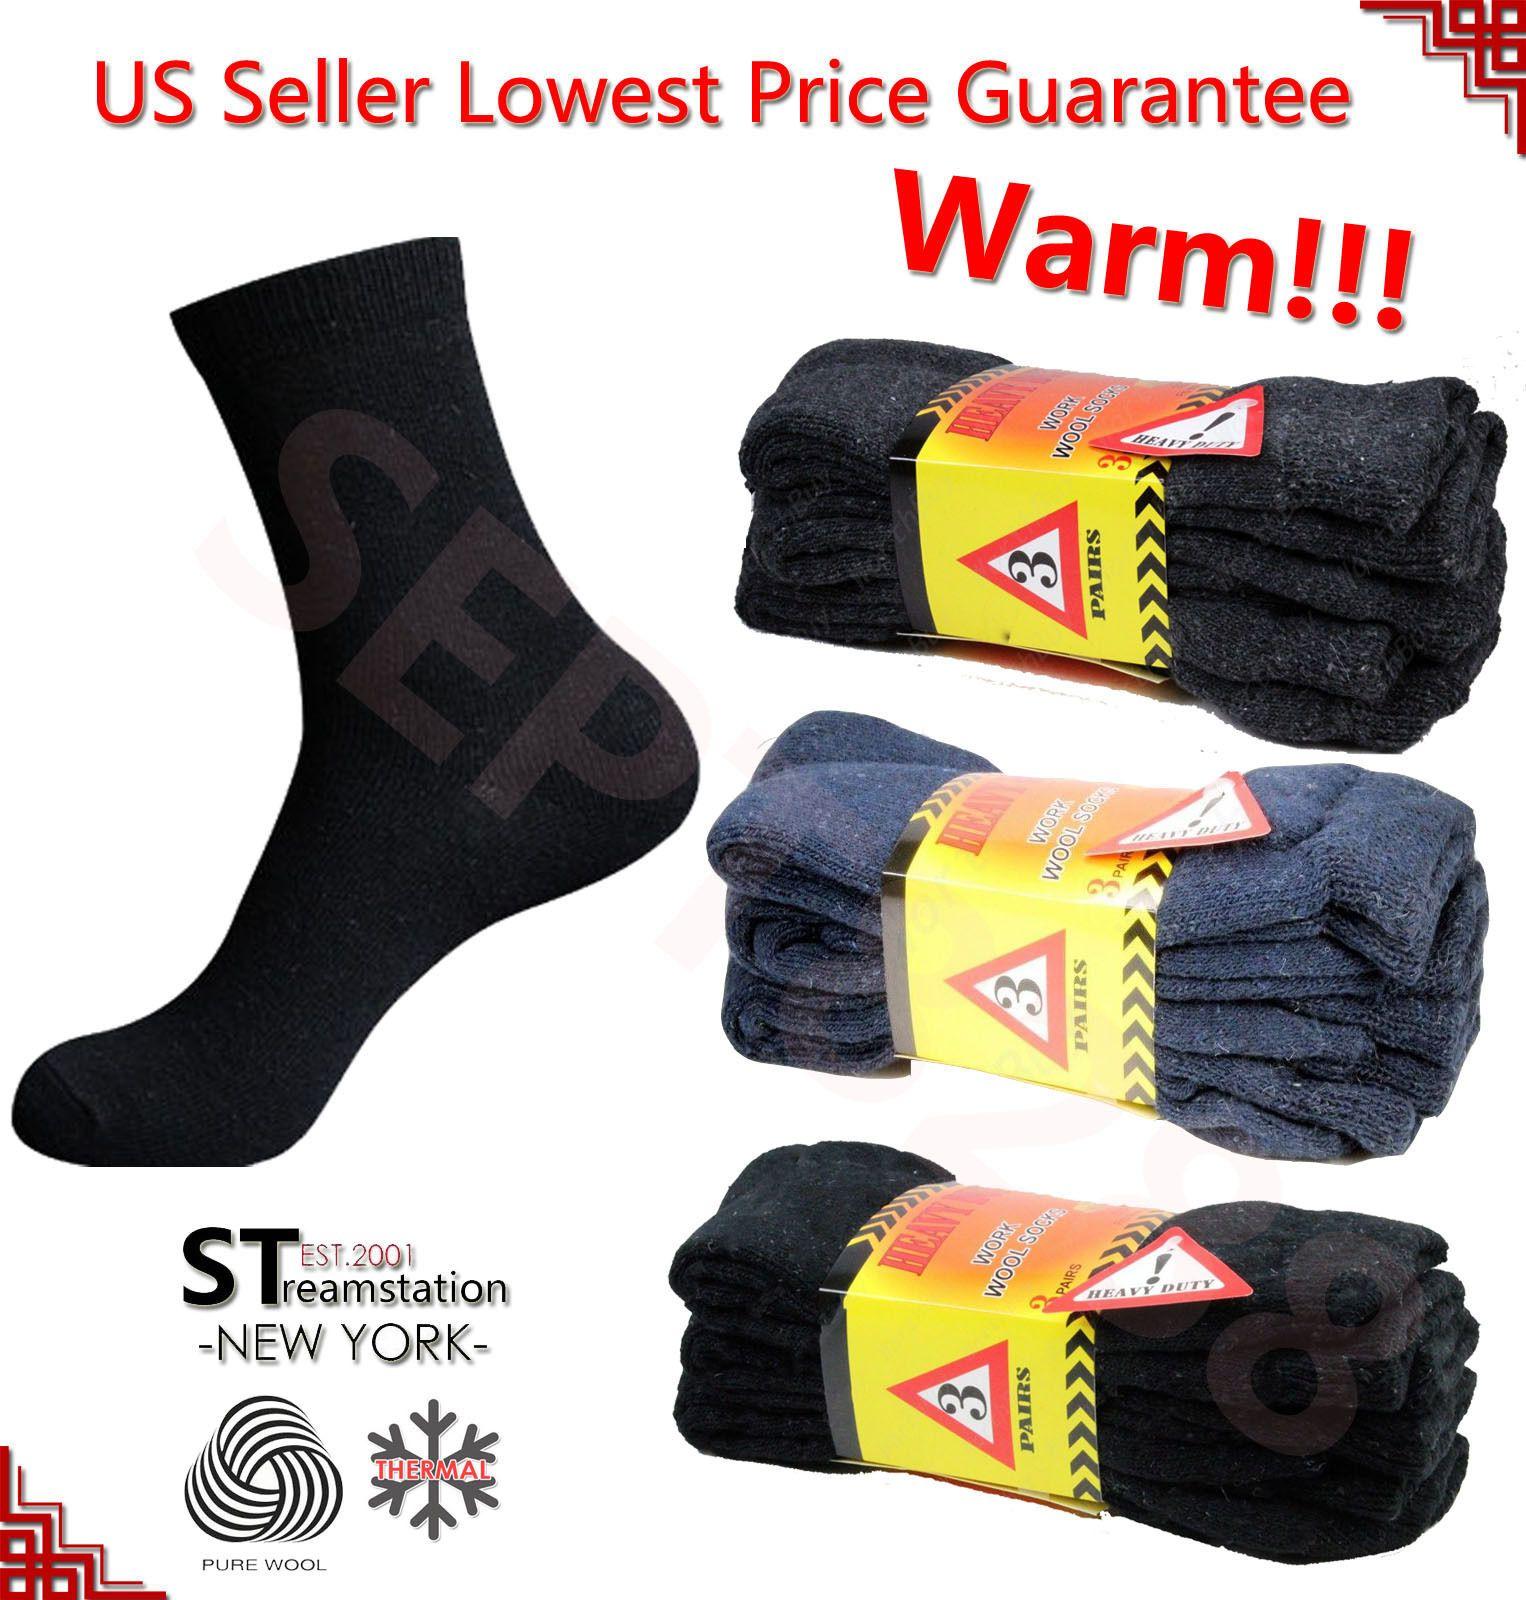 2018 1 Pair Mens Super Warm Heavy Thermal Merino Wool Winter Socks ONE SIZE